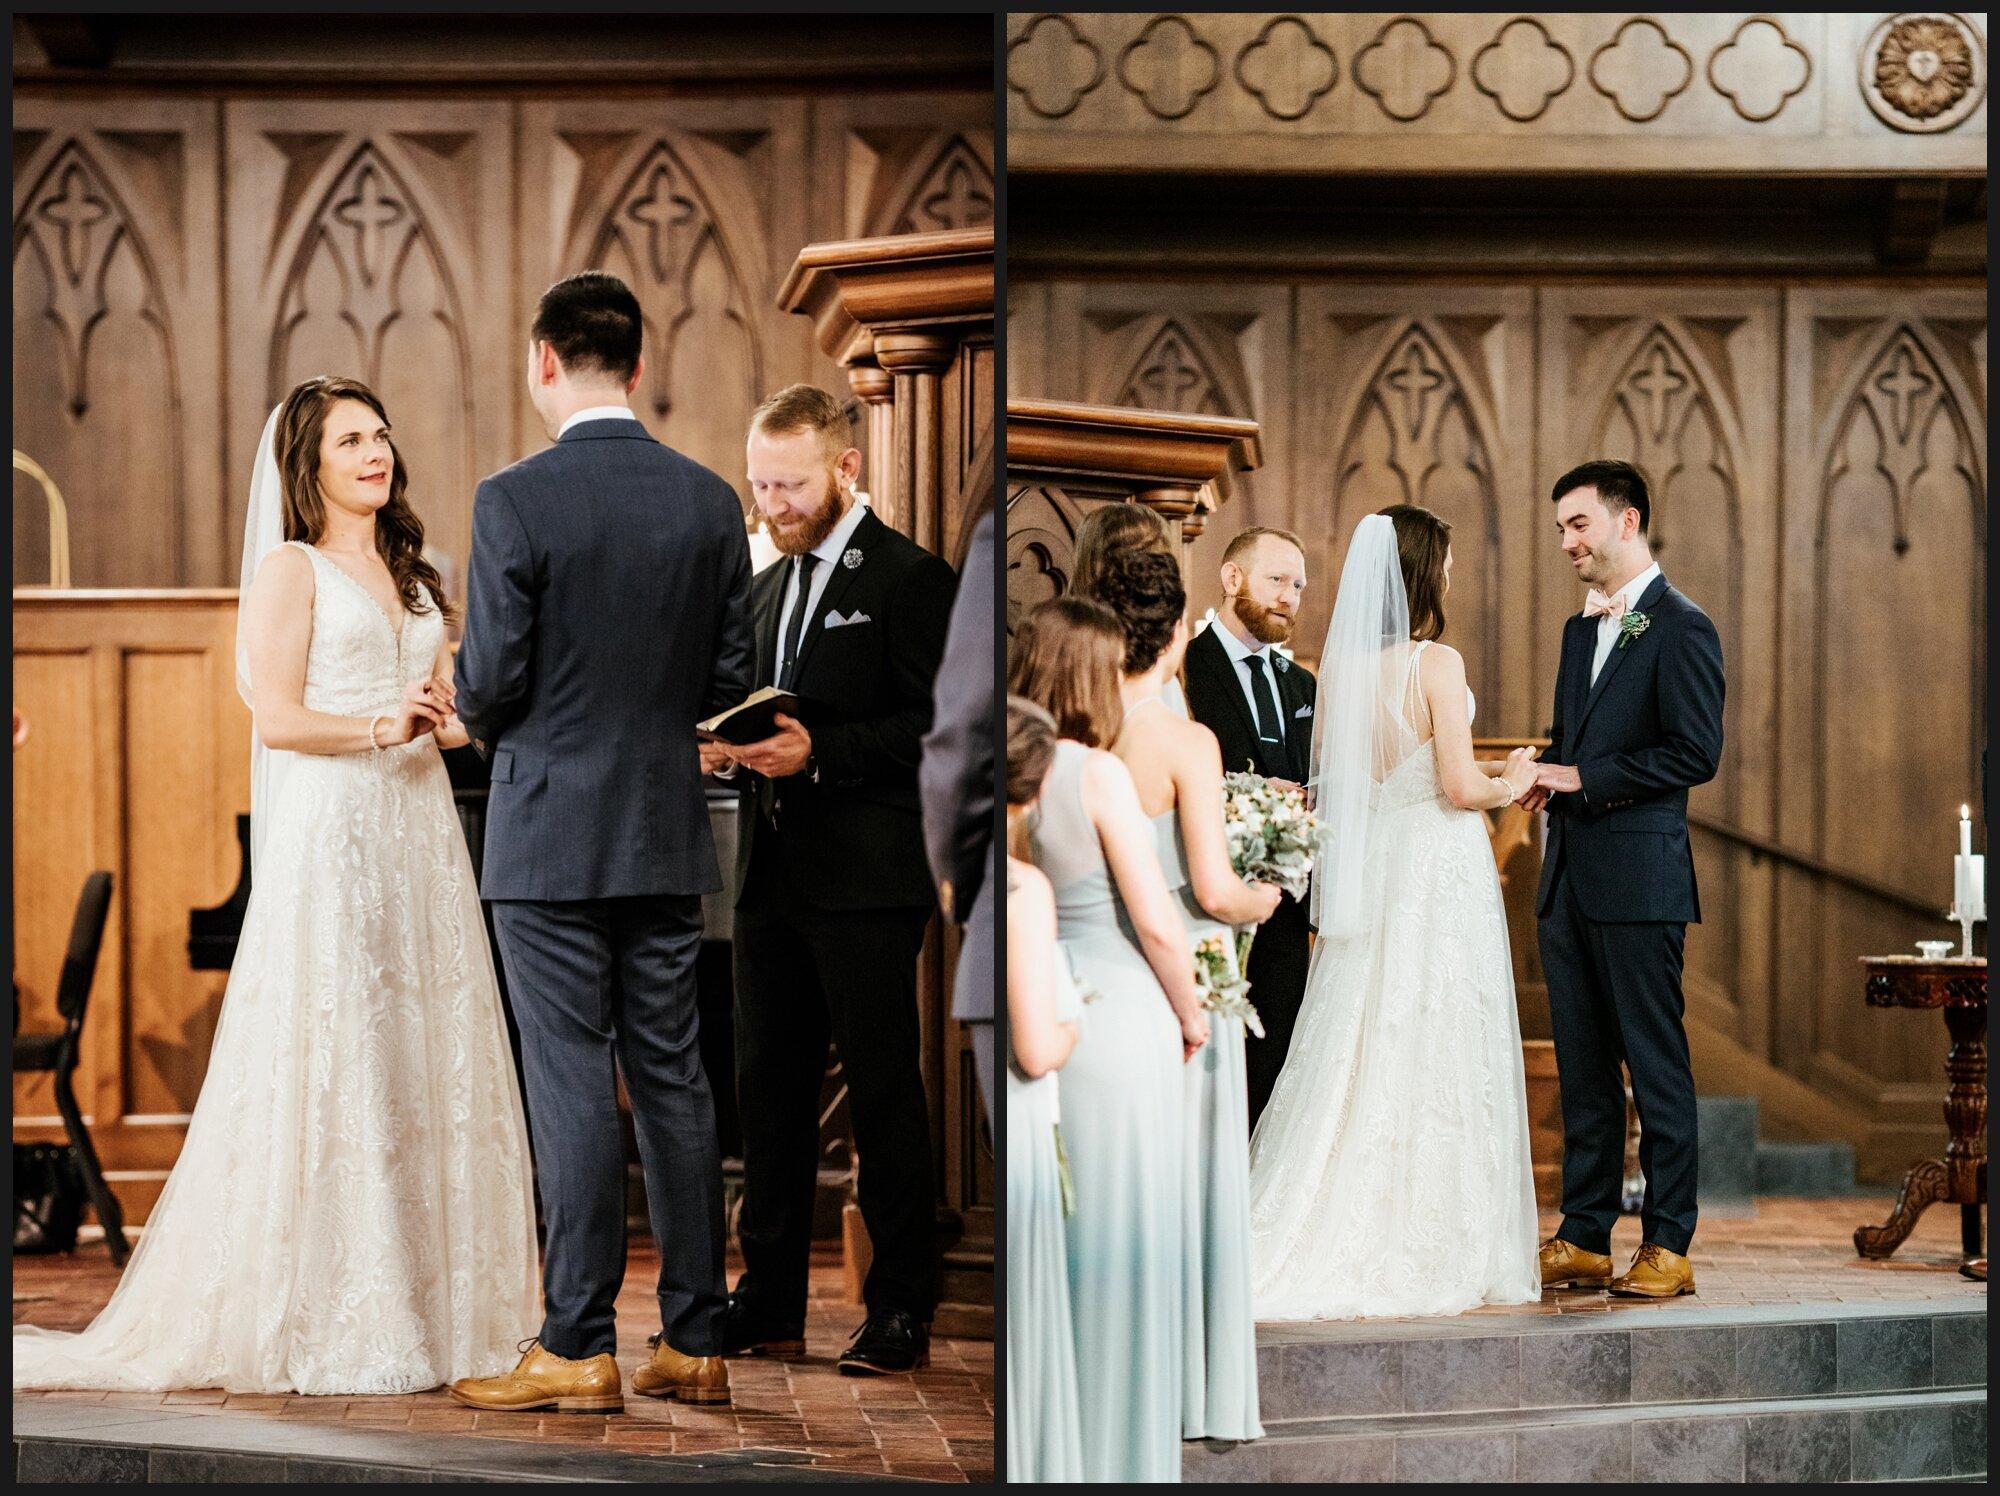 Orlando-Wedding-Photographer-destination-wedding-photographer-florida-wedding-photographer-hawaii-wedding-photographer_0633.jpg